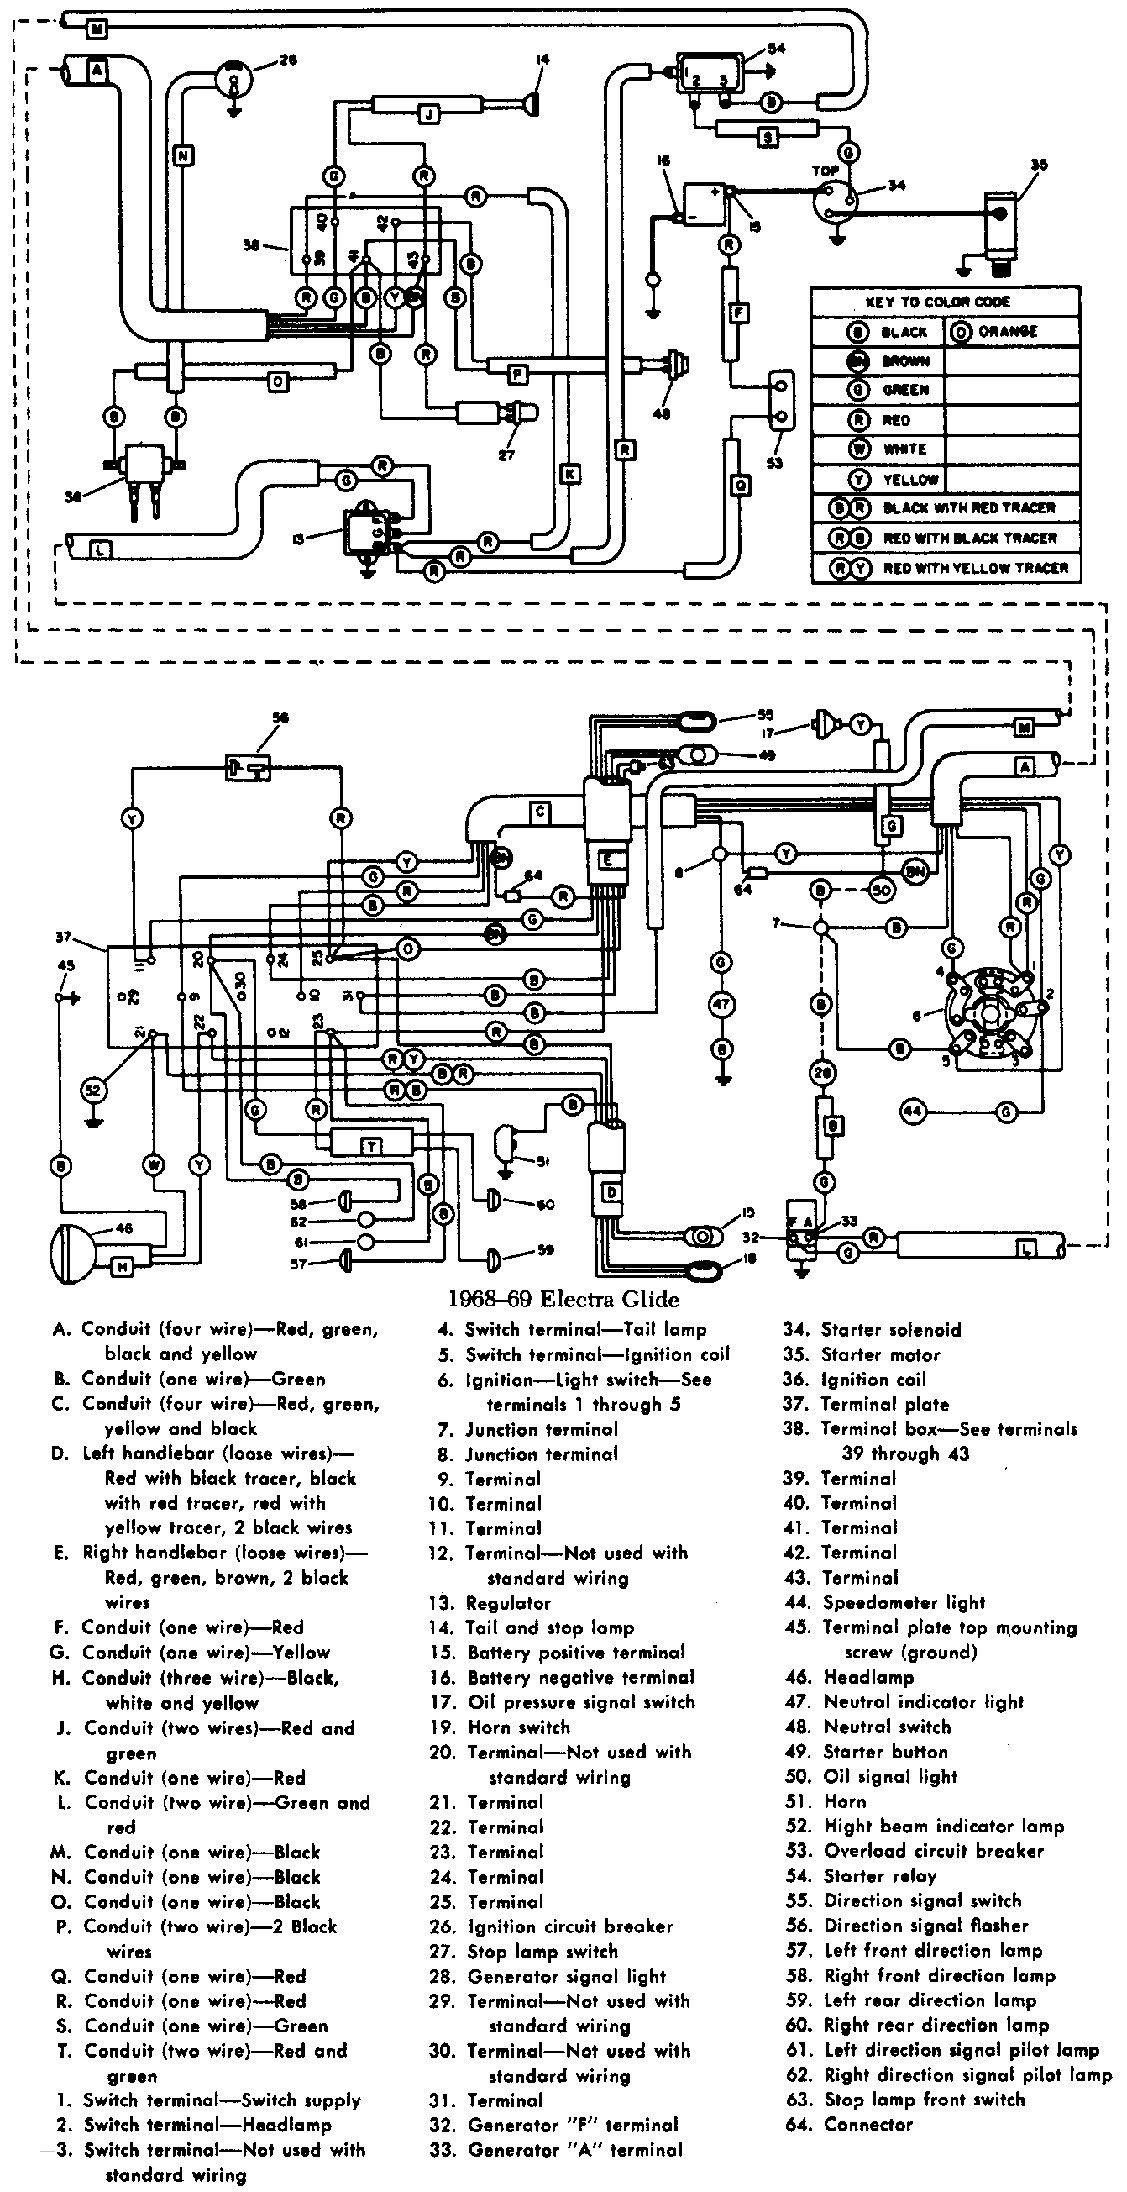 Harley Davidson Ignition Switch Wiring Diagram   Diagram, Harley davidson,  Harley   Ford Festiva Ignition Wiring Diagram Free Download      Pinterest